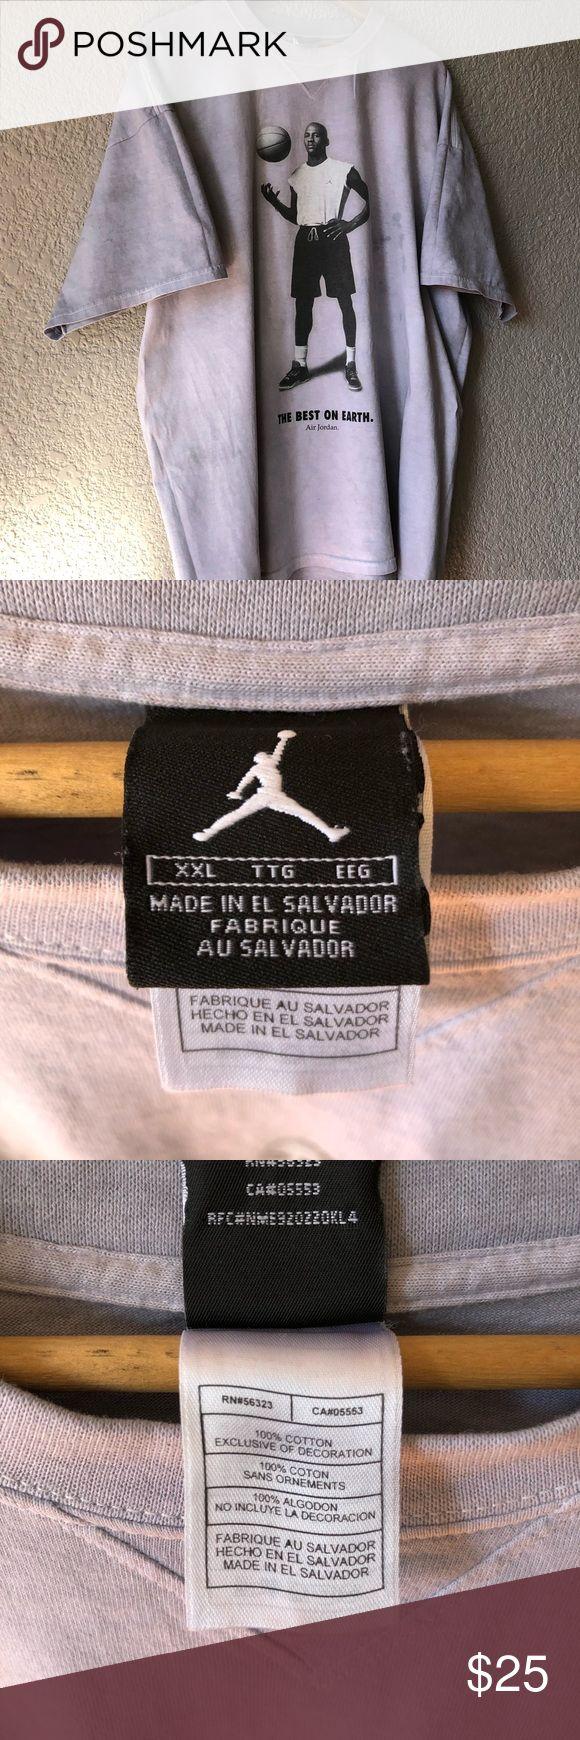 VTG Jordan 2XL Double Sided Graphic Tee RARE! VTG Jordan 2XL Double Sided Graphic Tee RARE! Jordan Shirts Tees - Short Sleeve